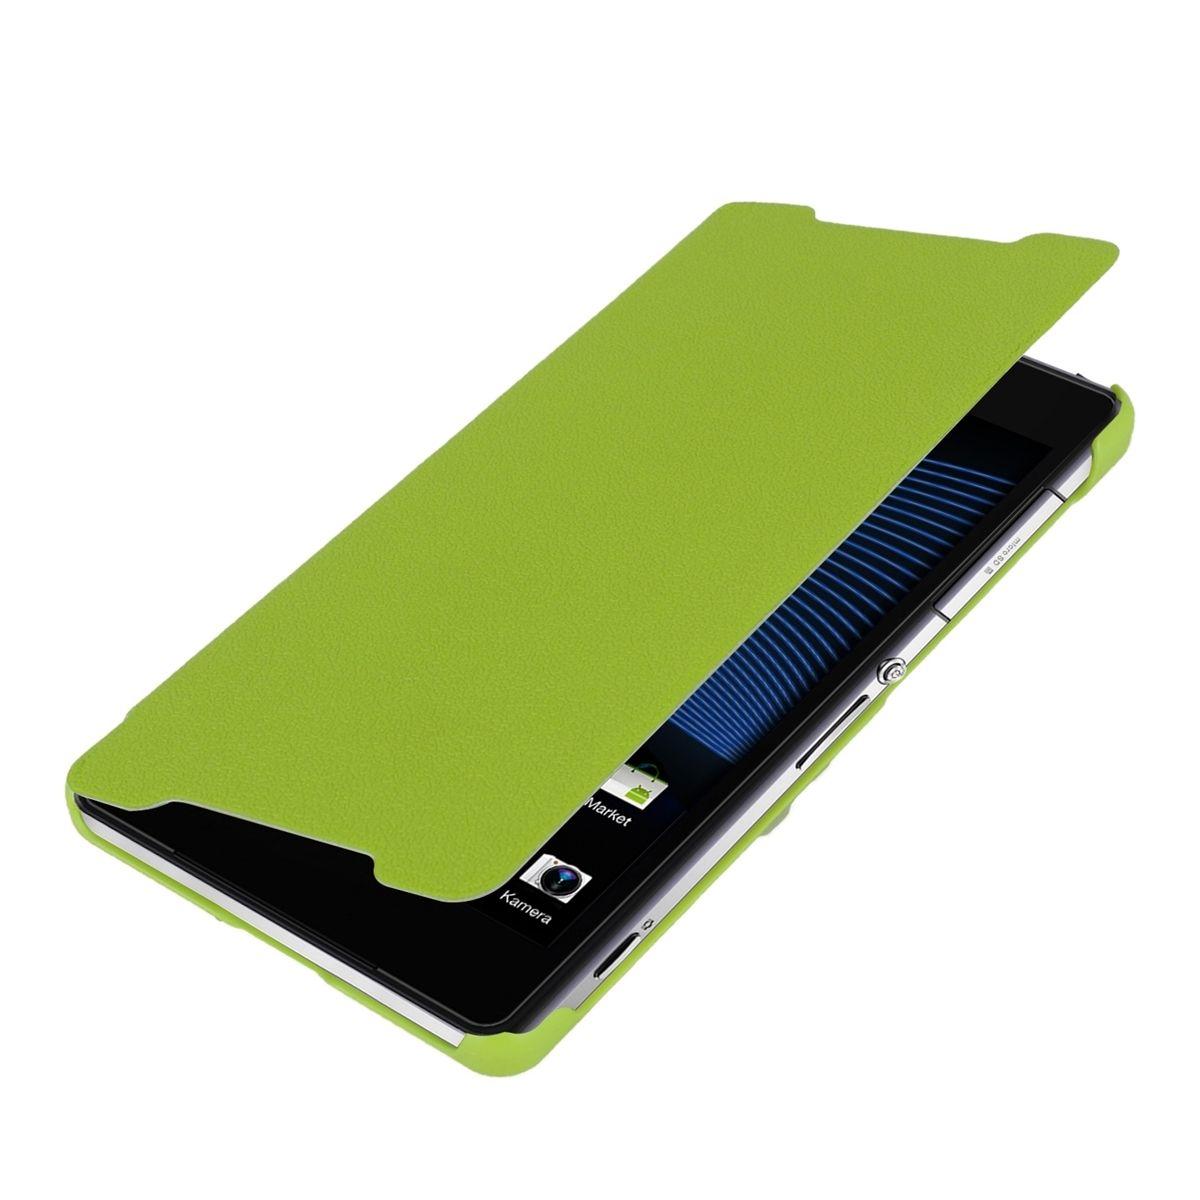 the latest daec2 b30e7 Flip cover for sony xperia z2 green case slim back shell hard mobile ...